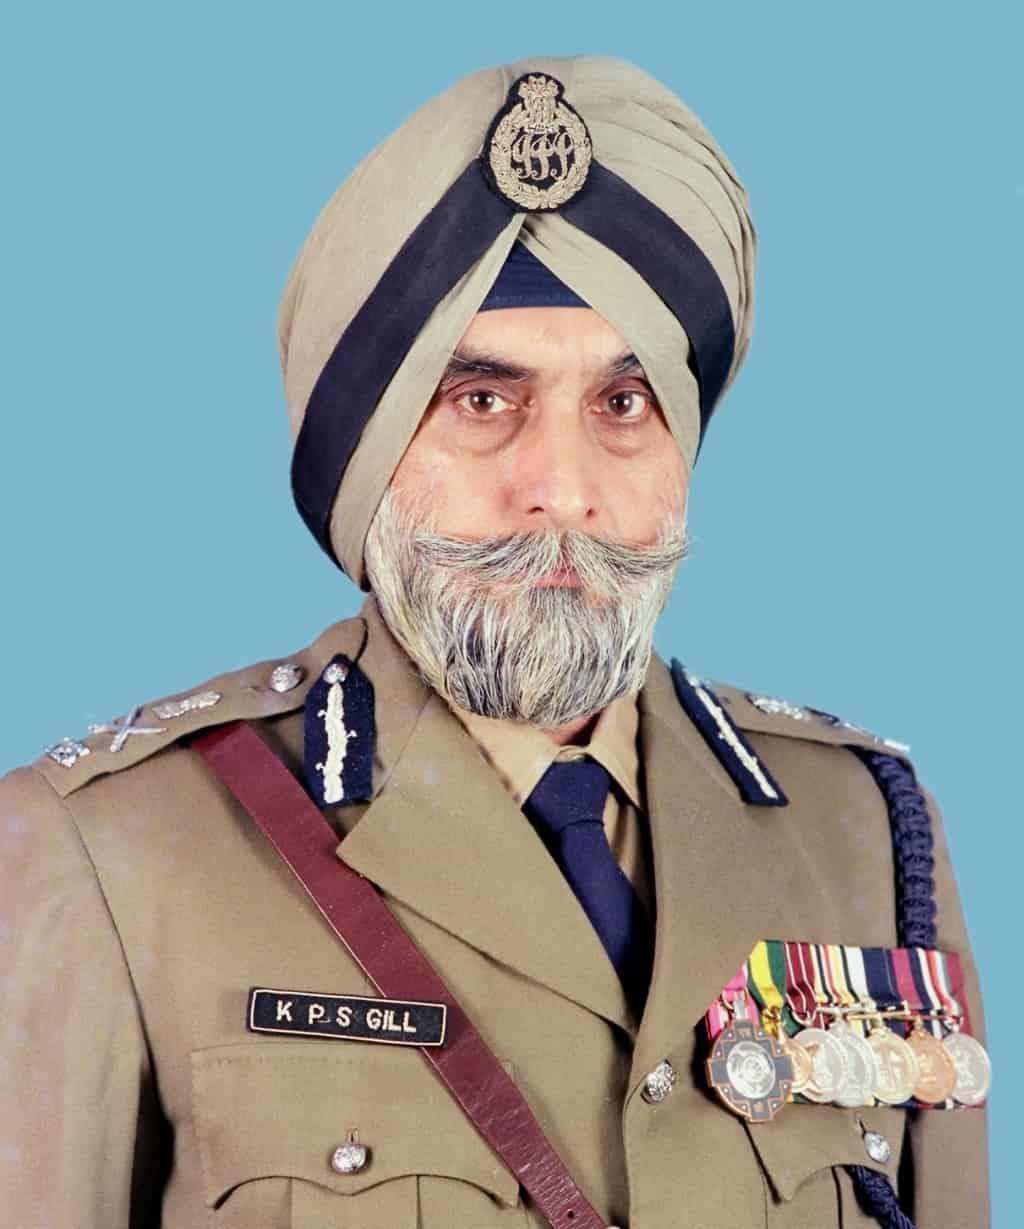 Captain amarinder singh attends antim ardas of former DGP KPS Gill